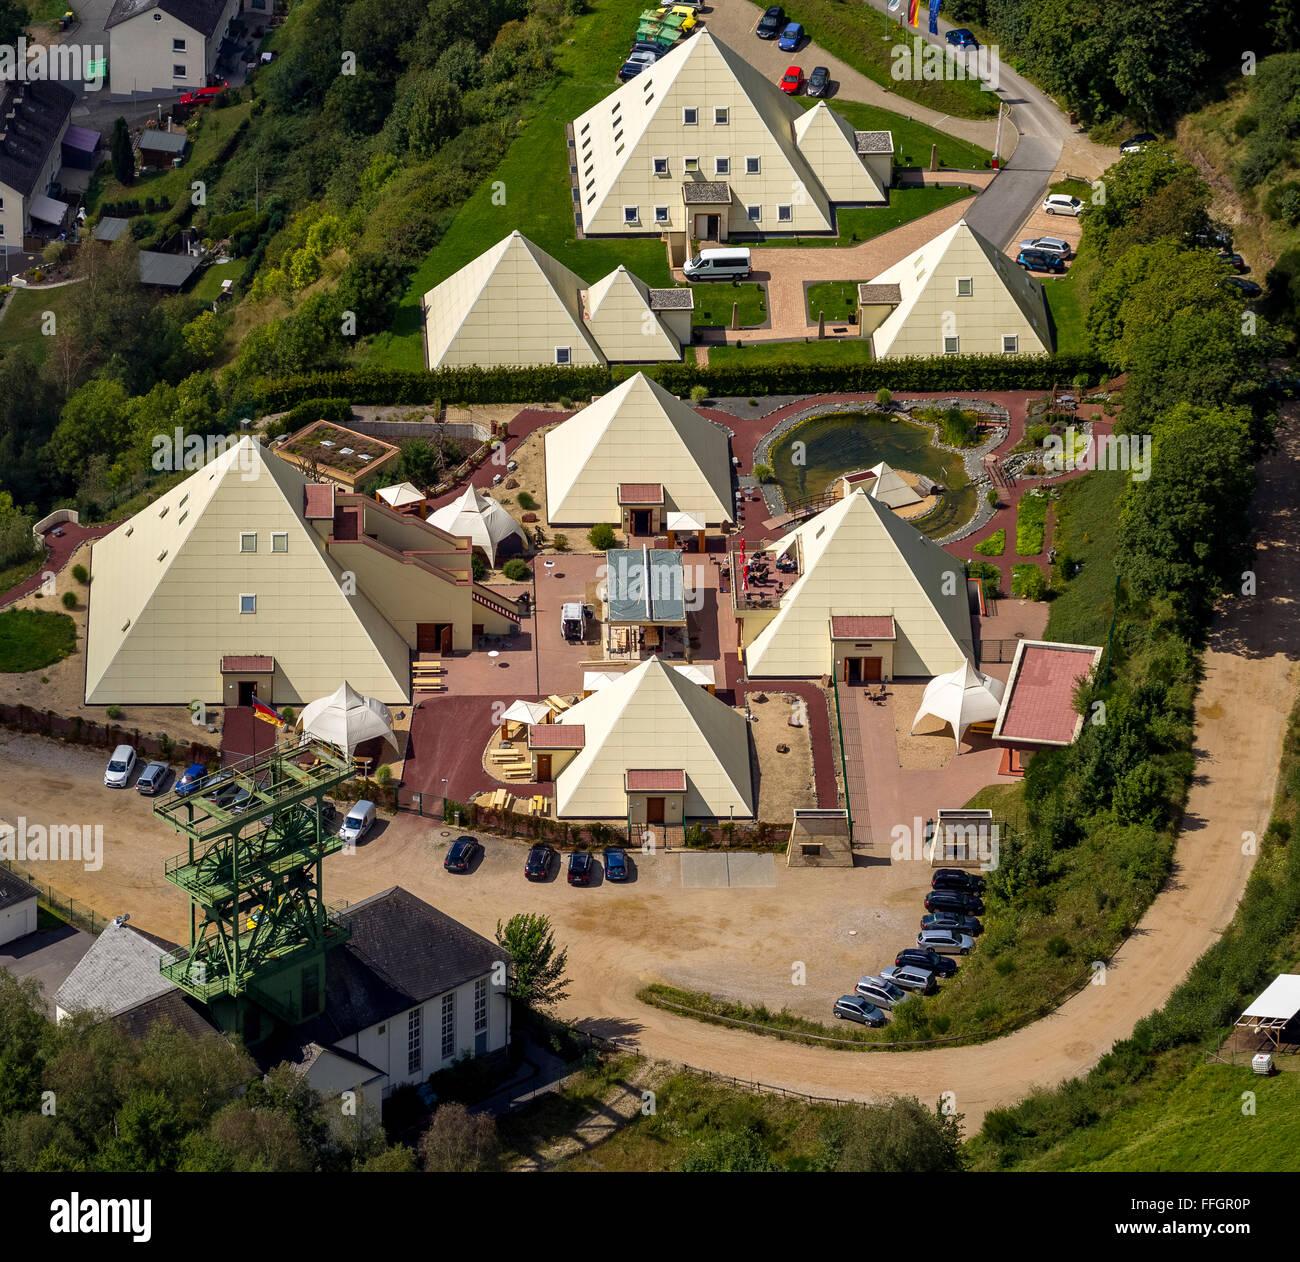 Aerial view, Galileo Park Sauerland pyramids, Lennestadt, Sauerland, North Rhine-Westphalia, Germany, Europe, Aerial - Stock Image